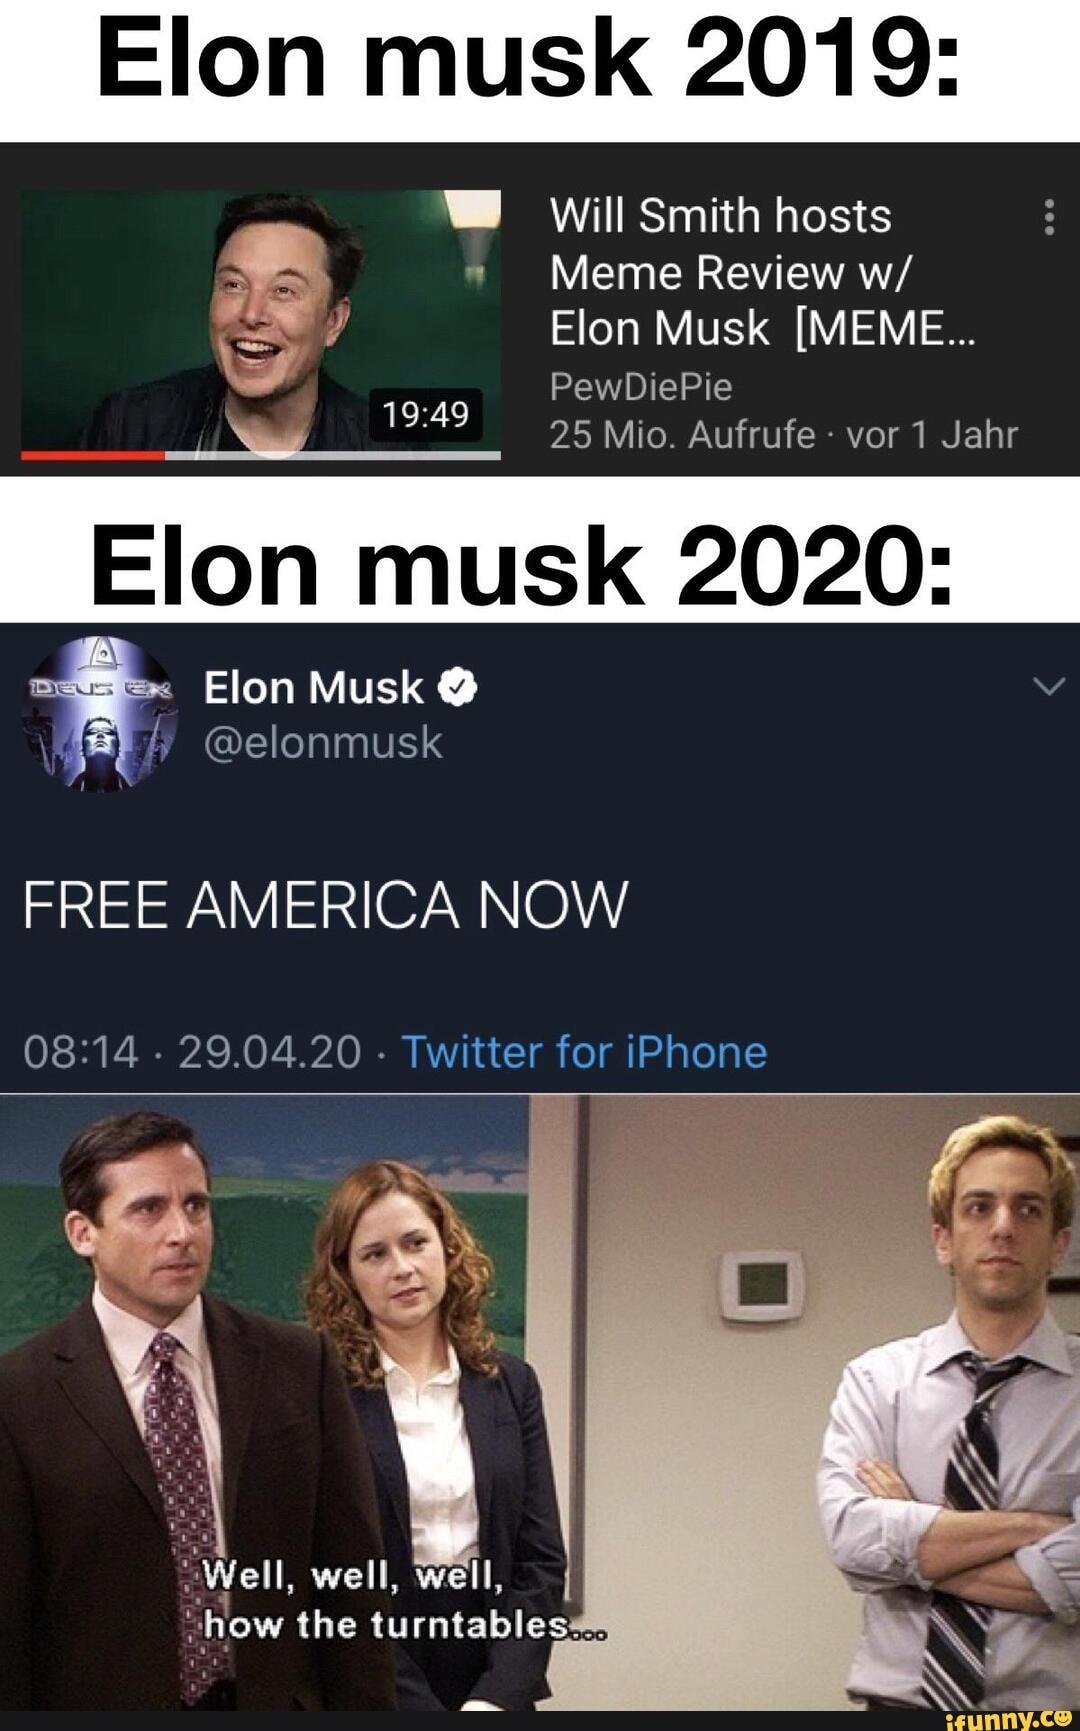 Elon musk 2019: W Will Smith hosts Meme Review w/ Elon ...